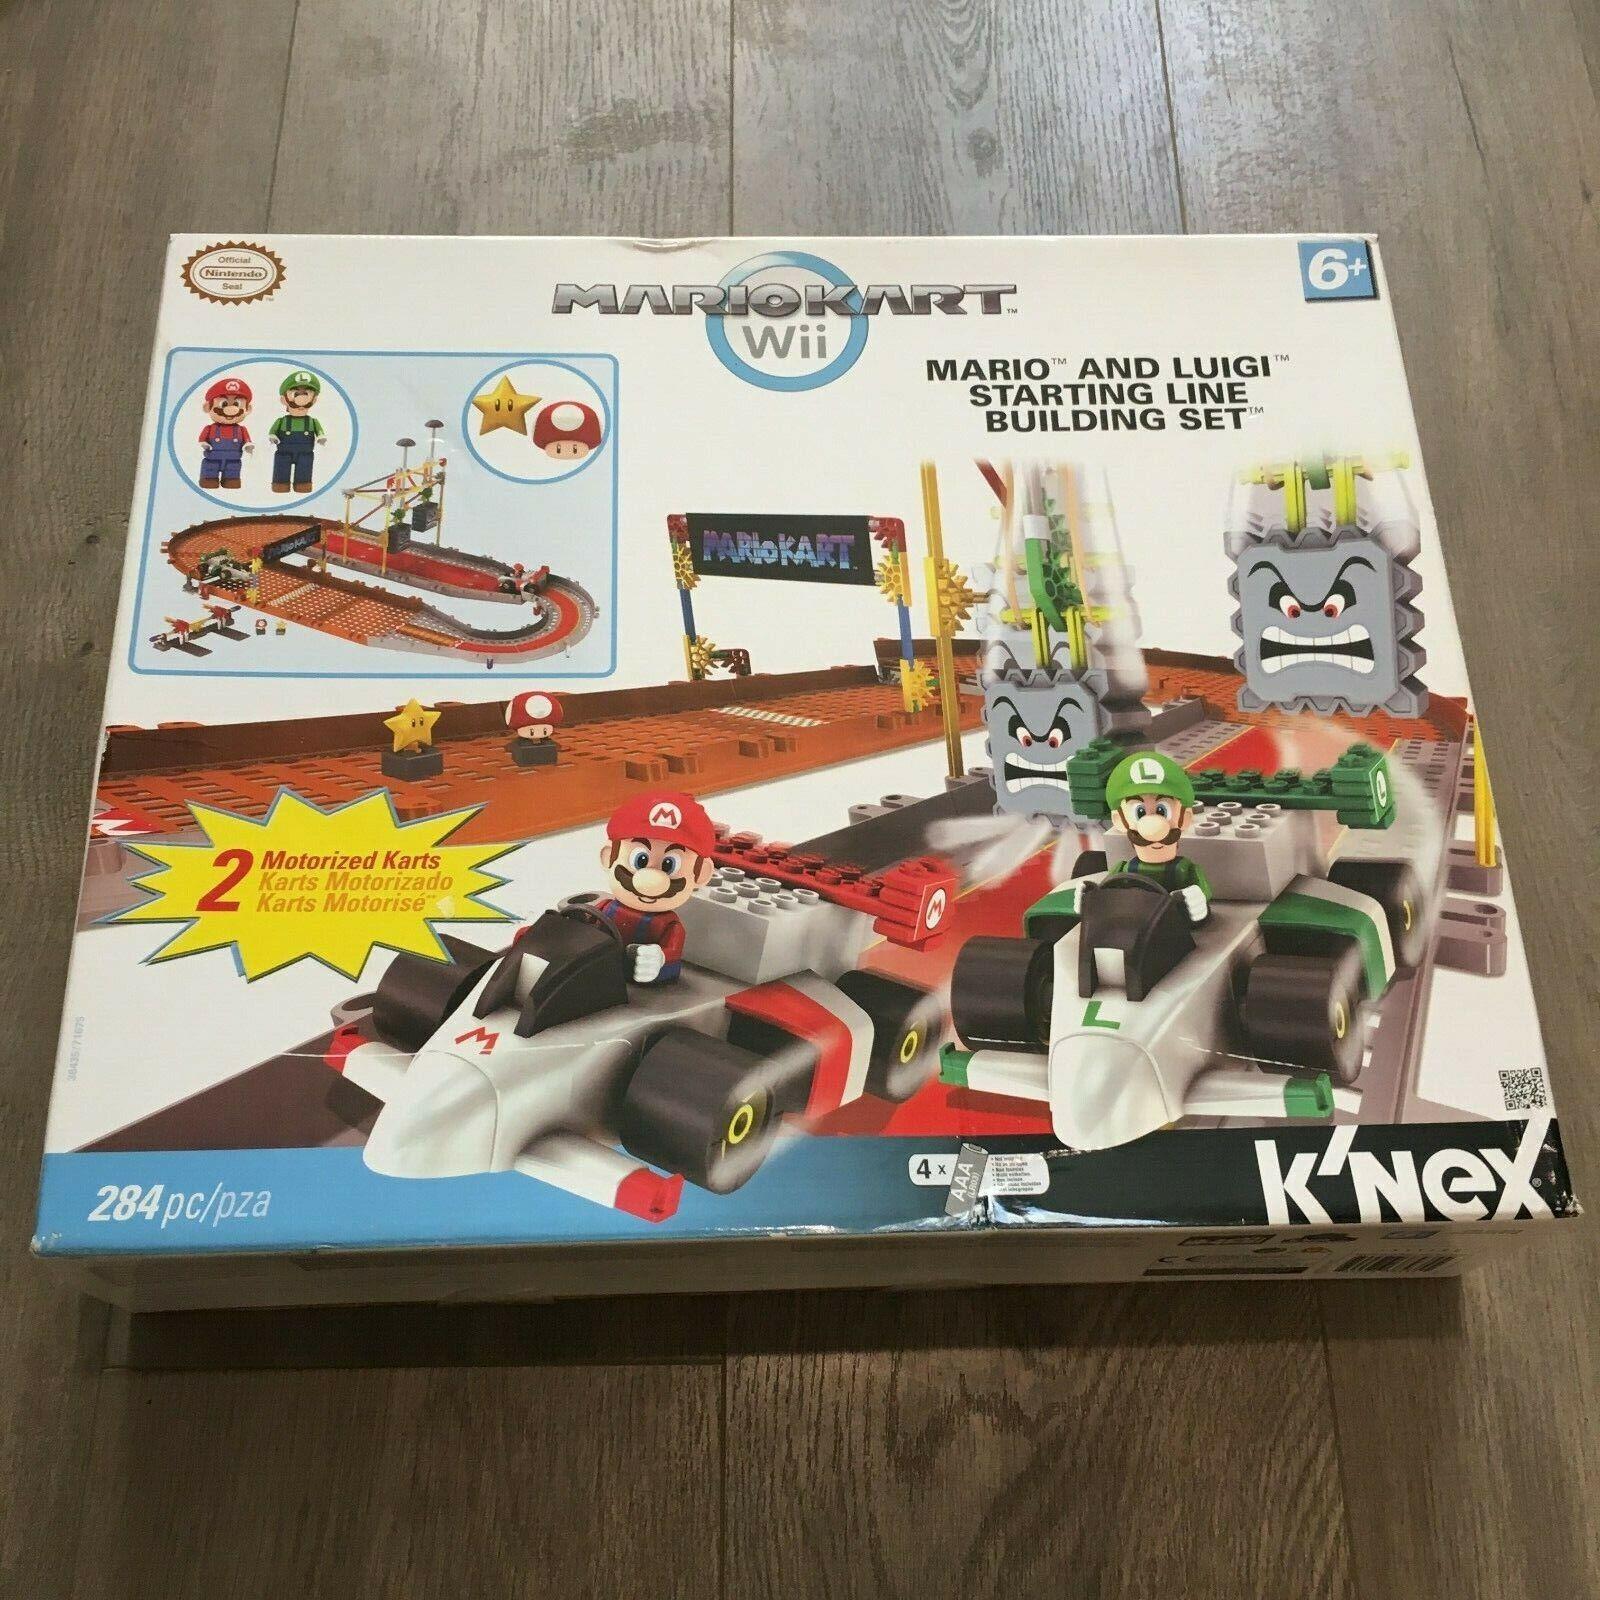 New In Box K'NEX MarioKart Wii Starting Line Mario & Luigi Building Set Videogam